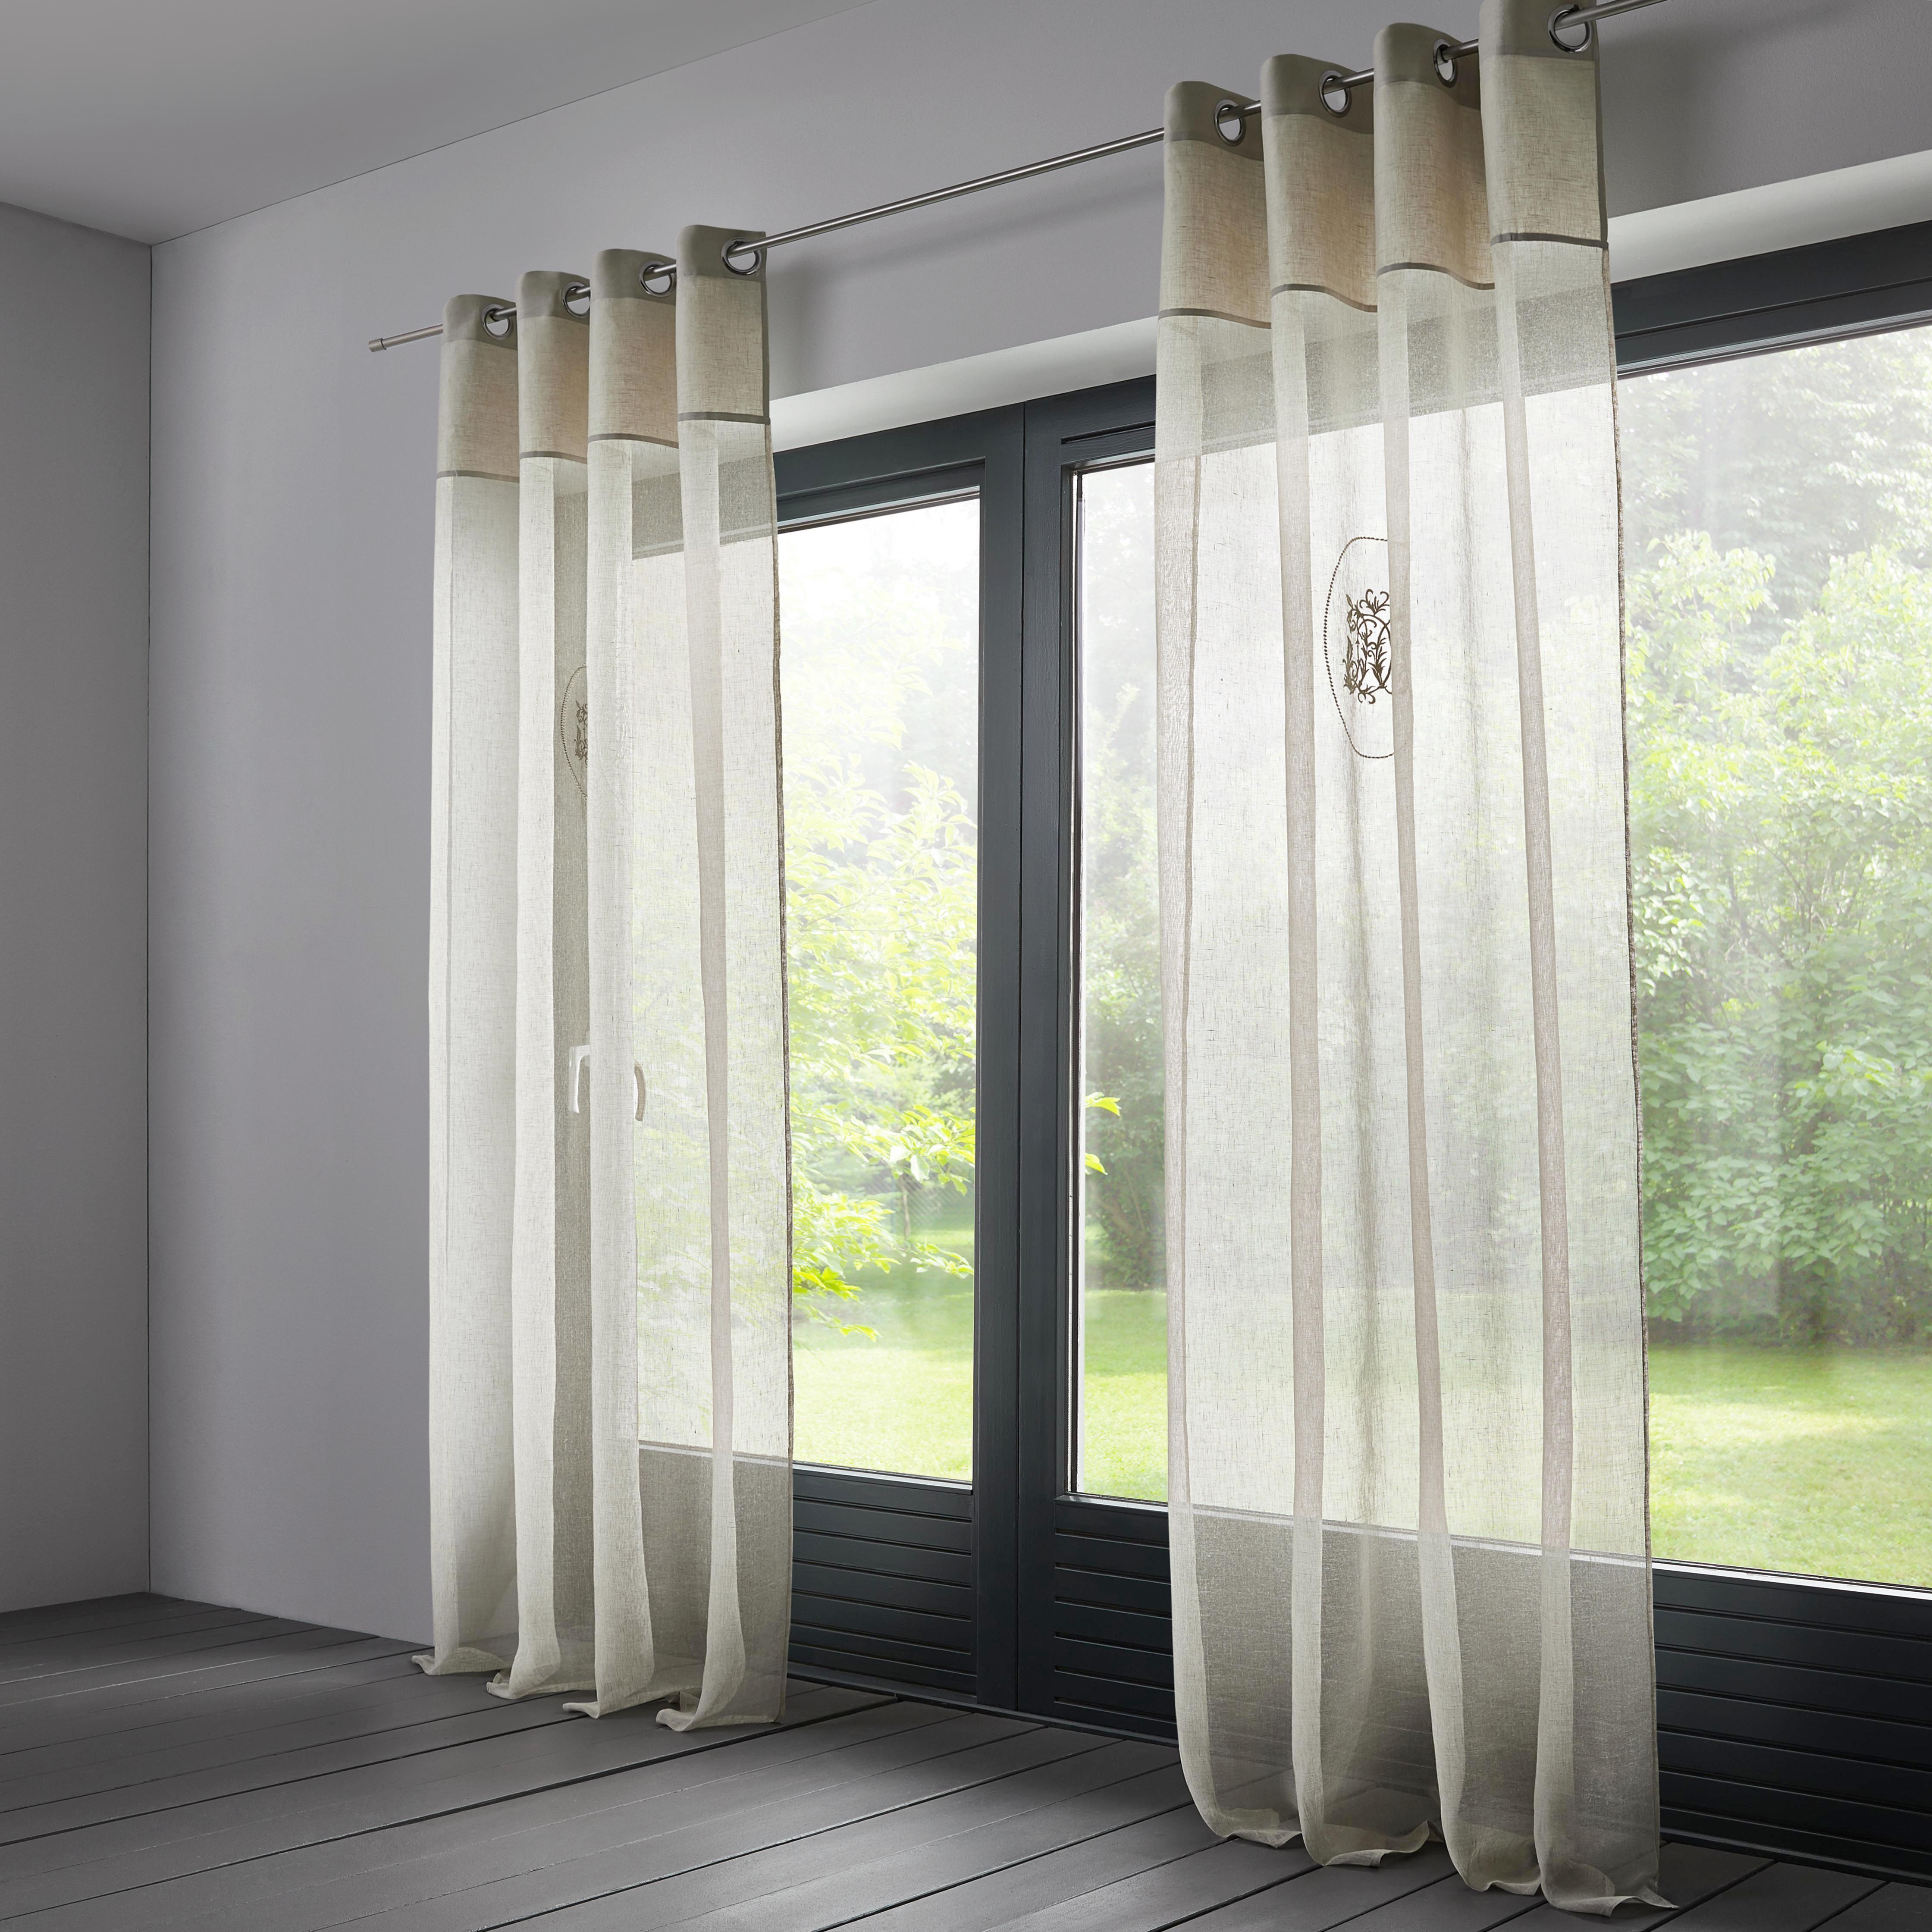 Leinenvorhang Emily 140x245cm - Naturfarben, KONVENTIONELL, Textil (140/245cm) - MÖMAX modern living